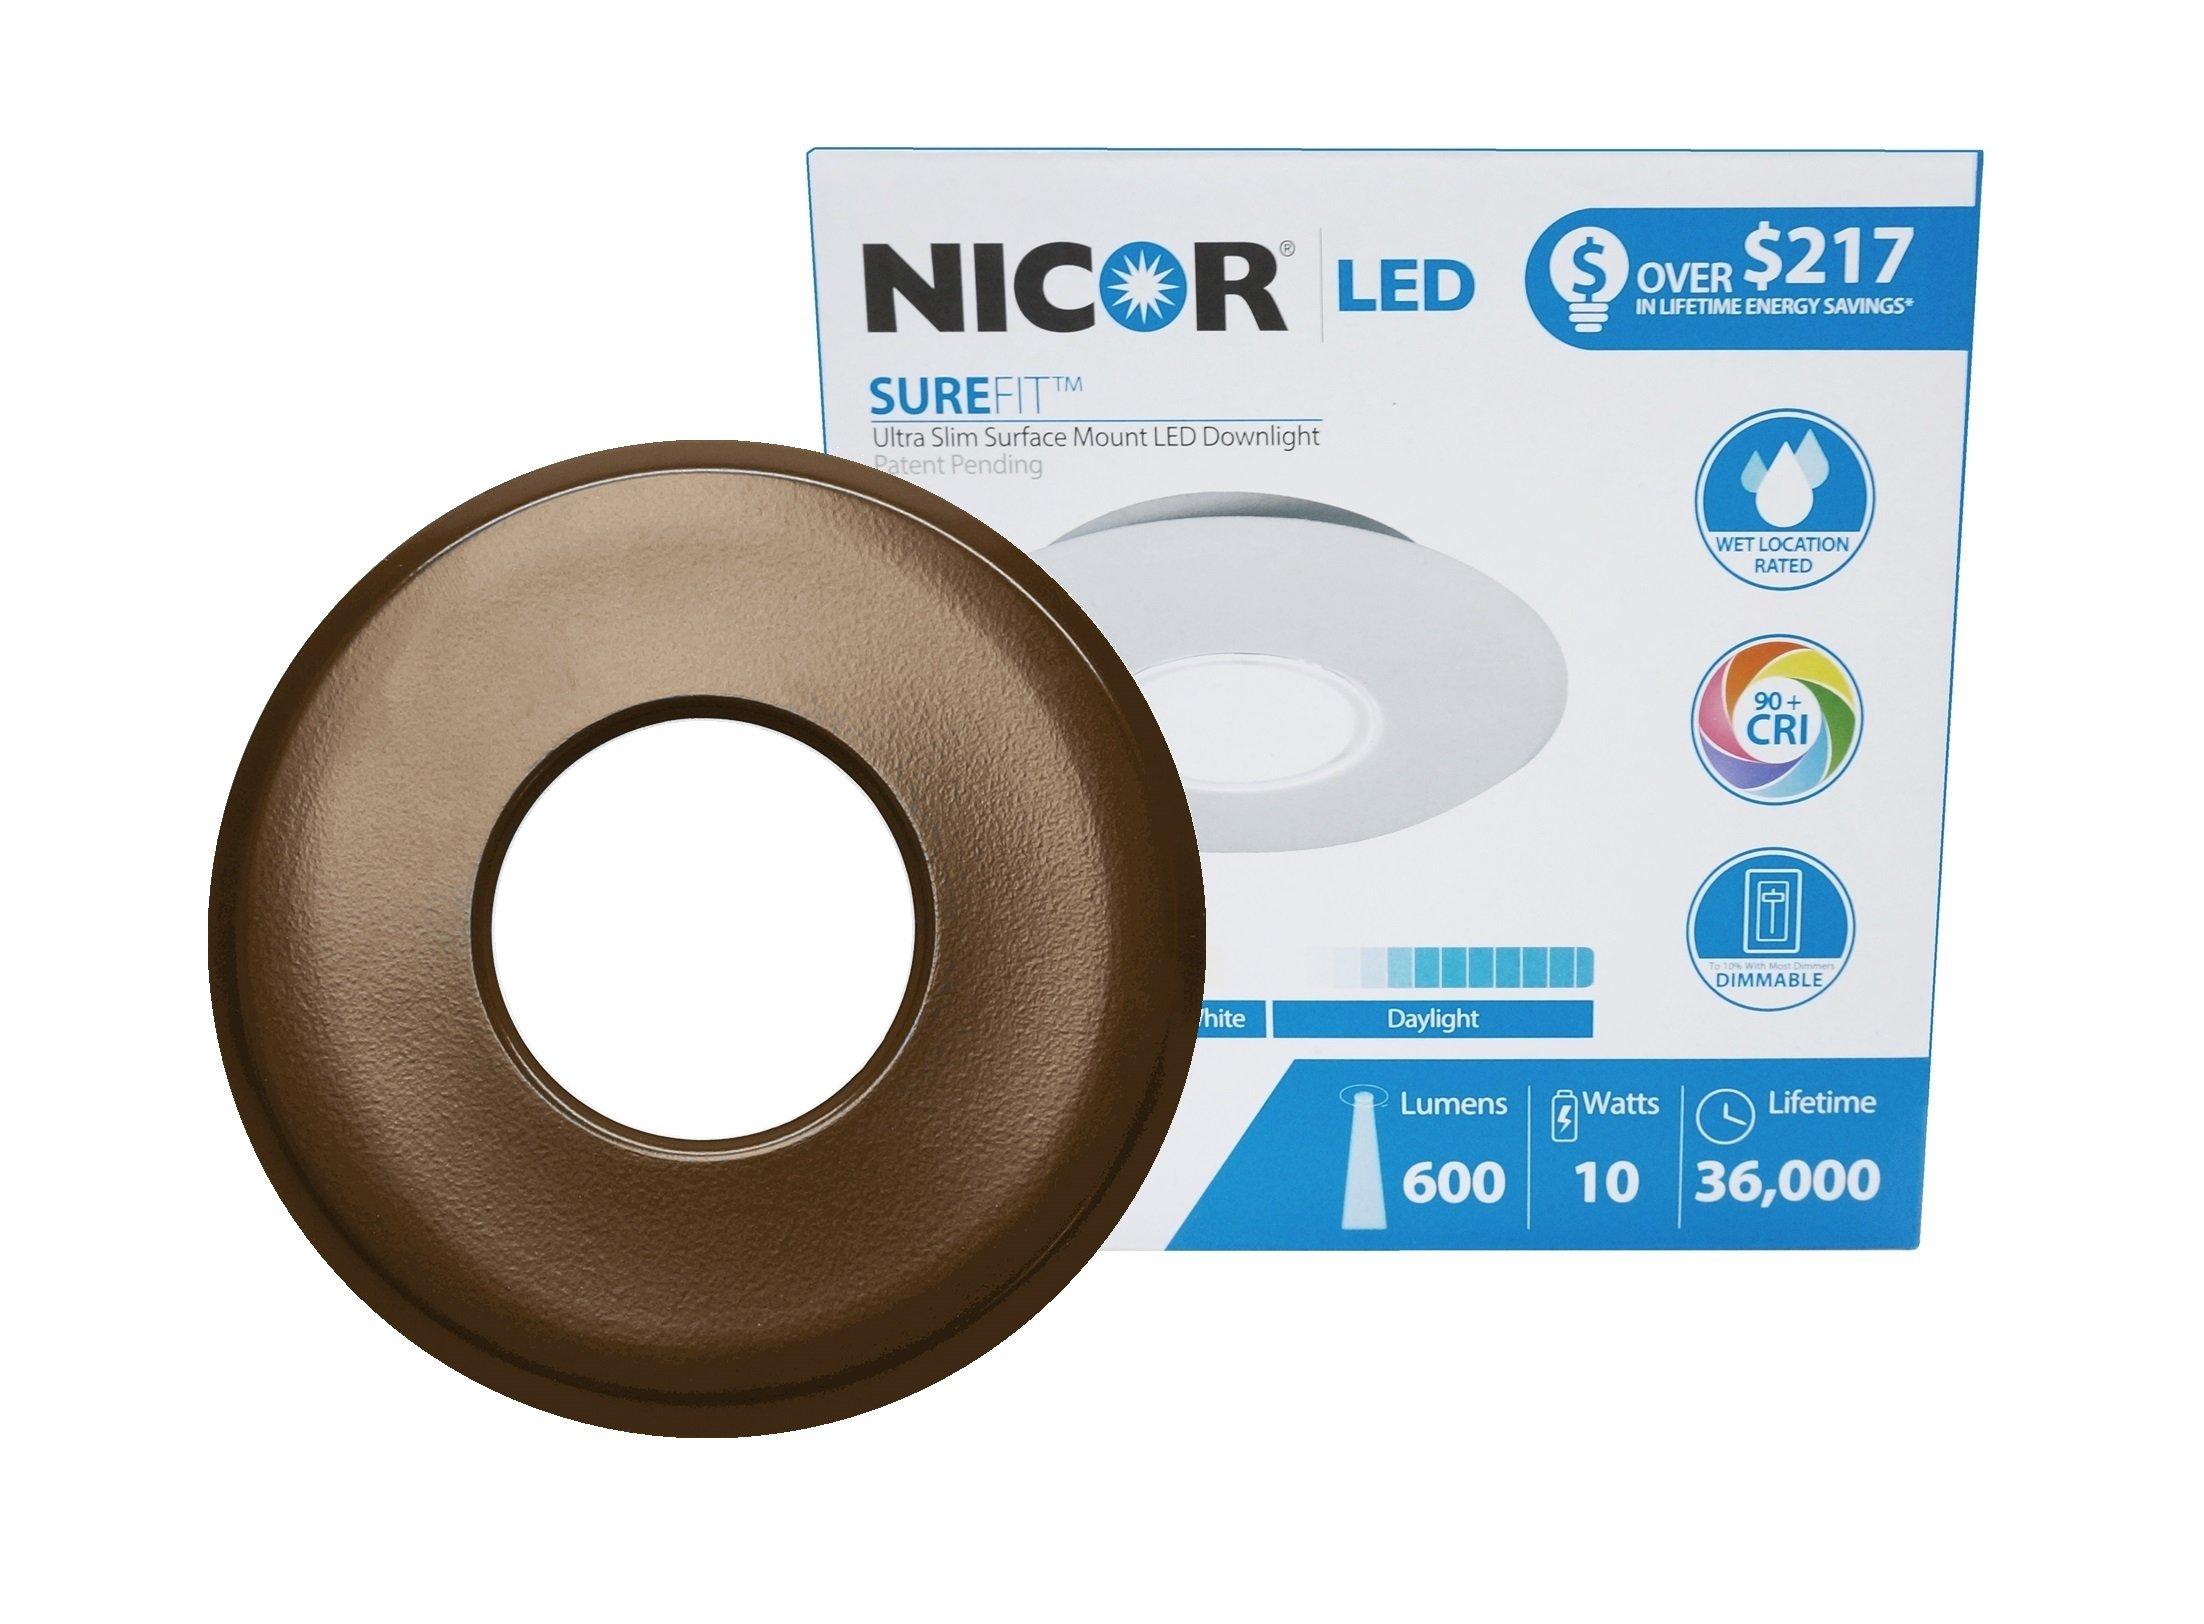 NICOR Lighting SureFit 5.25-inch Round Ultra Slim 3000K LED Junction Box Retrofit Downlight Kit, Oil-Rubbed Bronze (DLF-10-120-3K-RD-OB) by NICOR Lighting